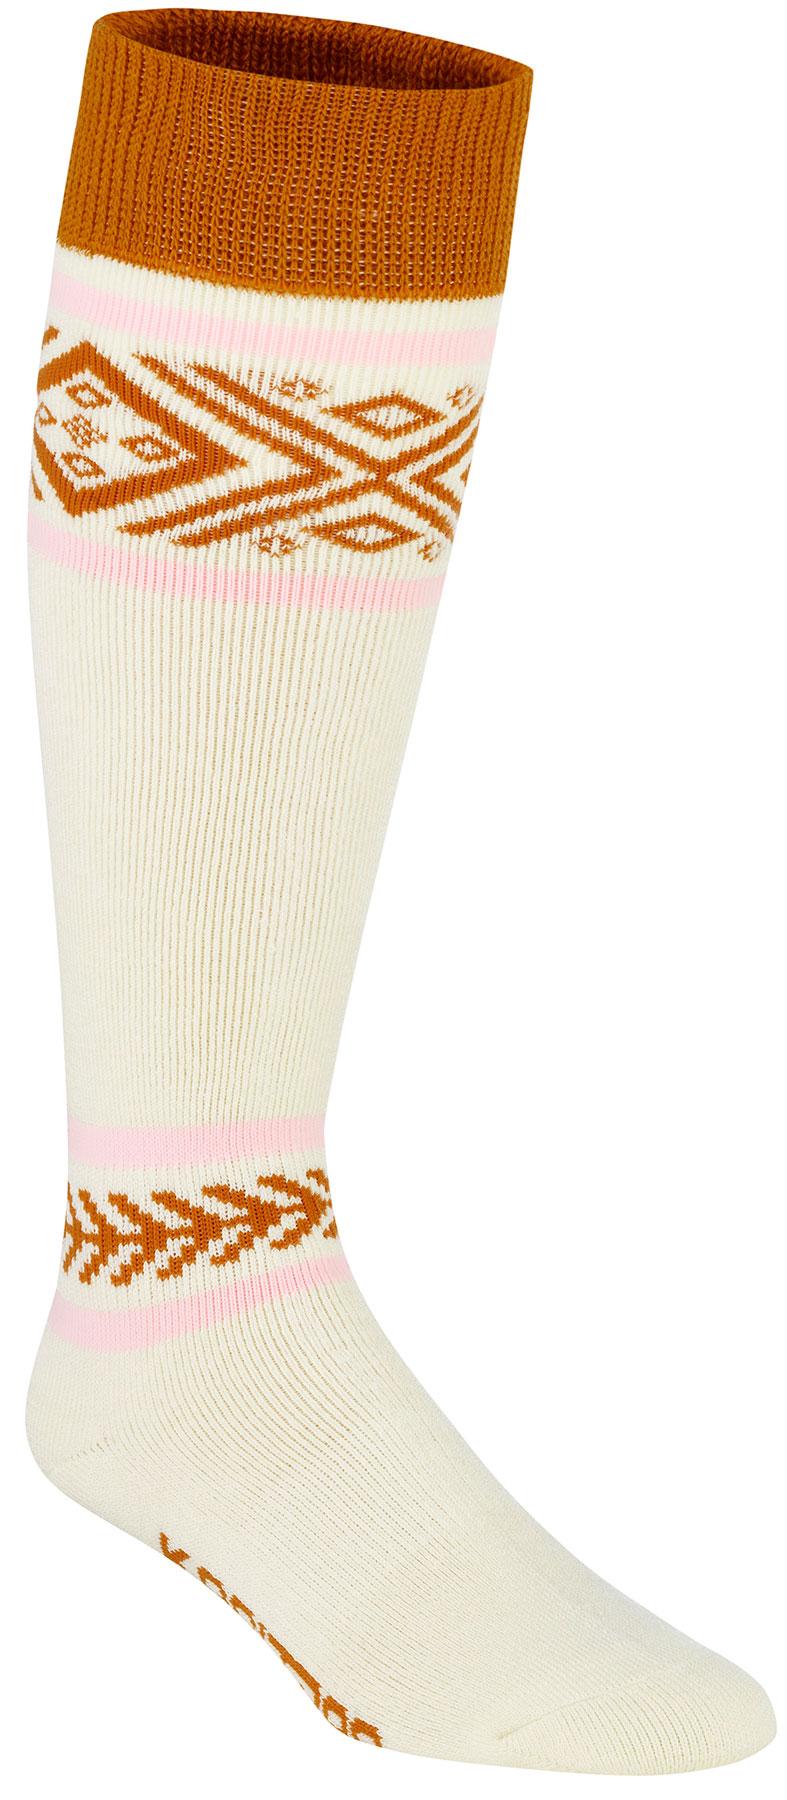 Kari Traa Floke Sock Women's - nwhite